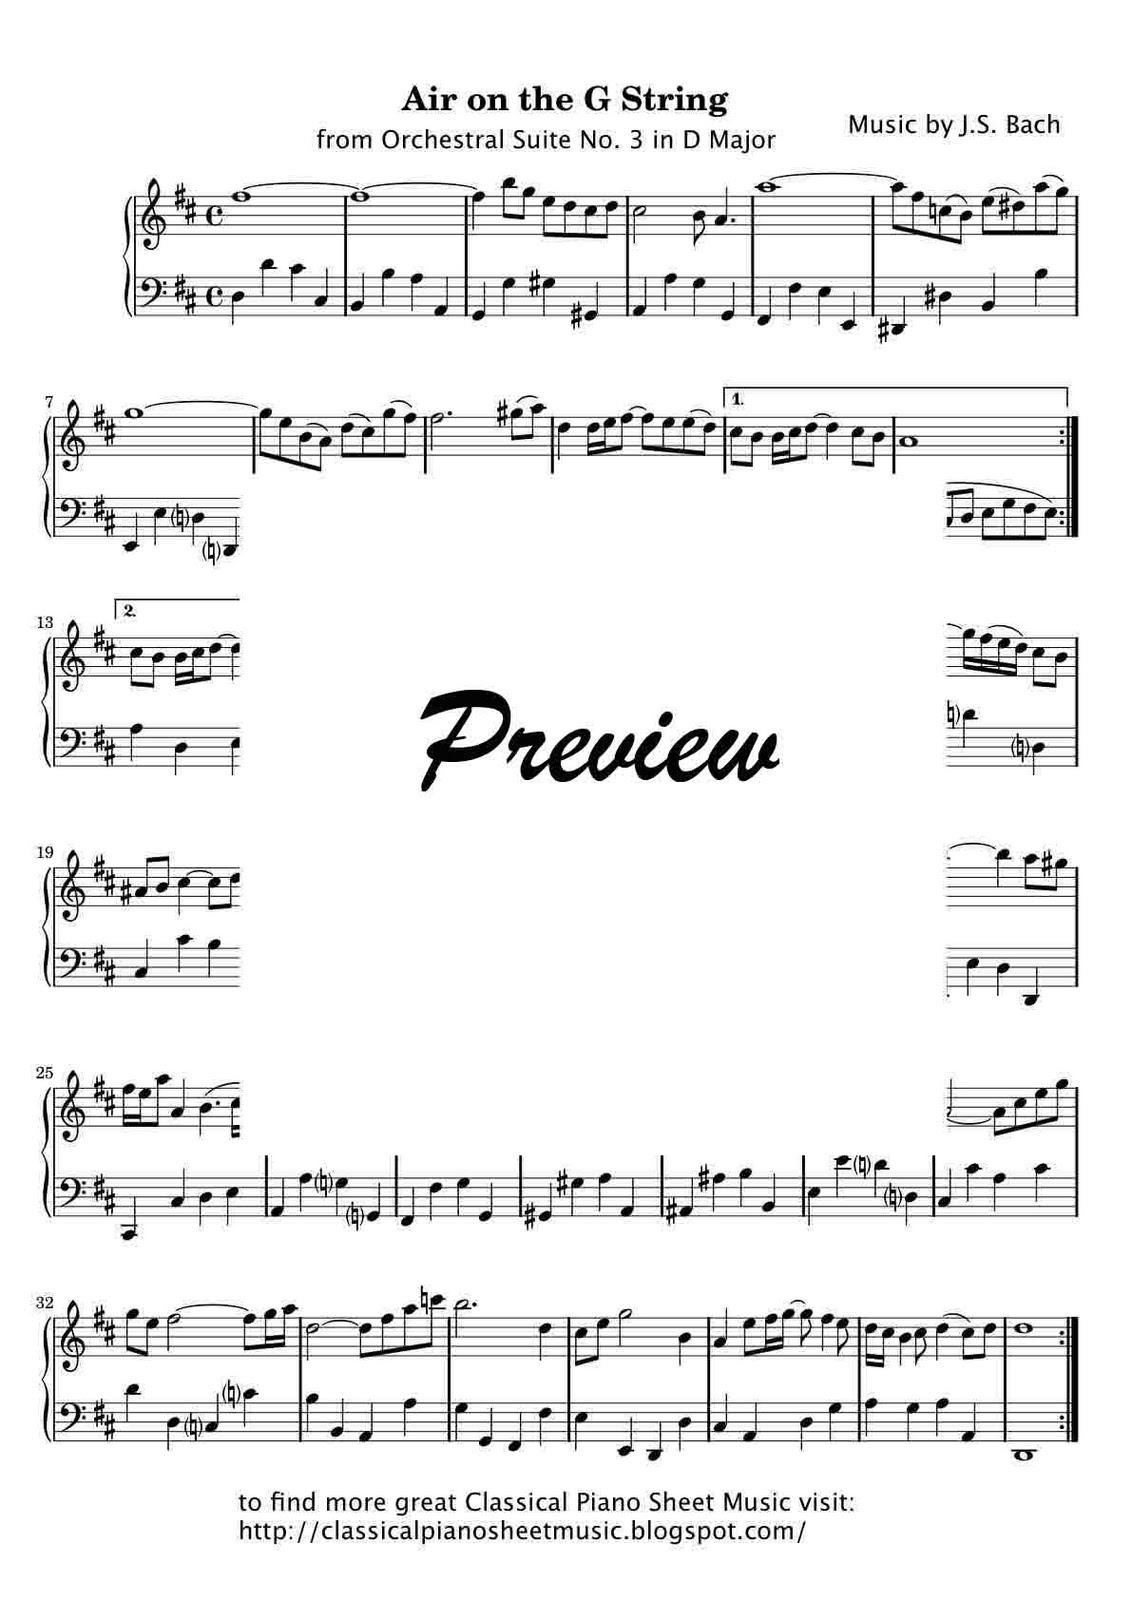 bach air on the g string piano sheet music pdf